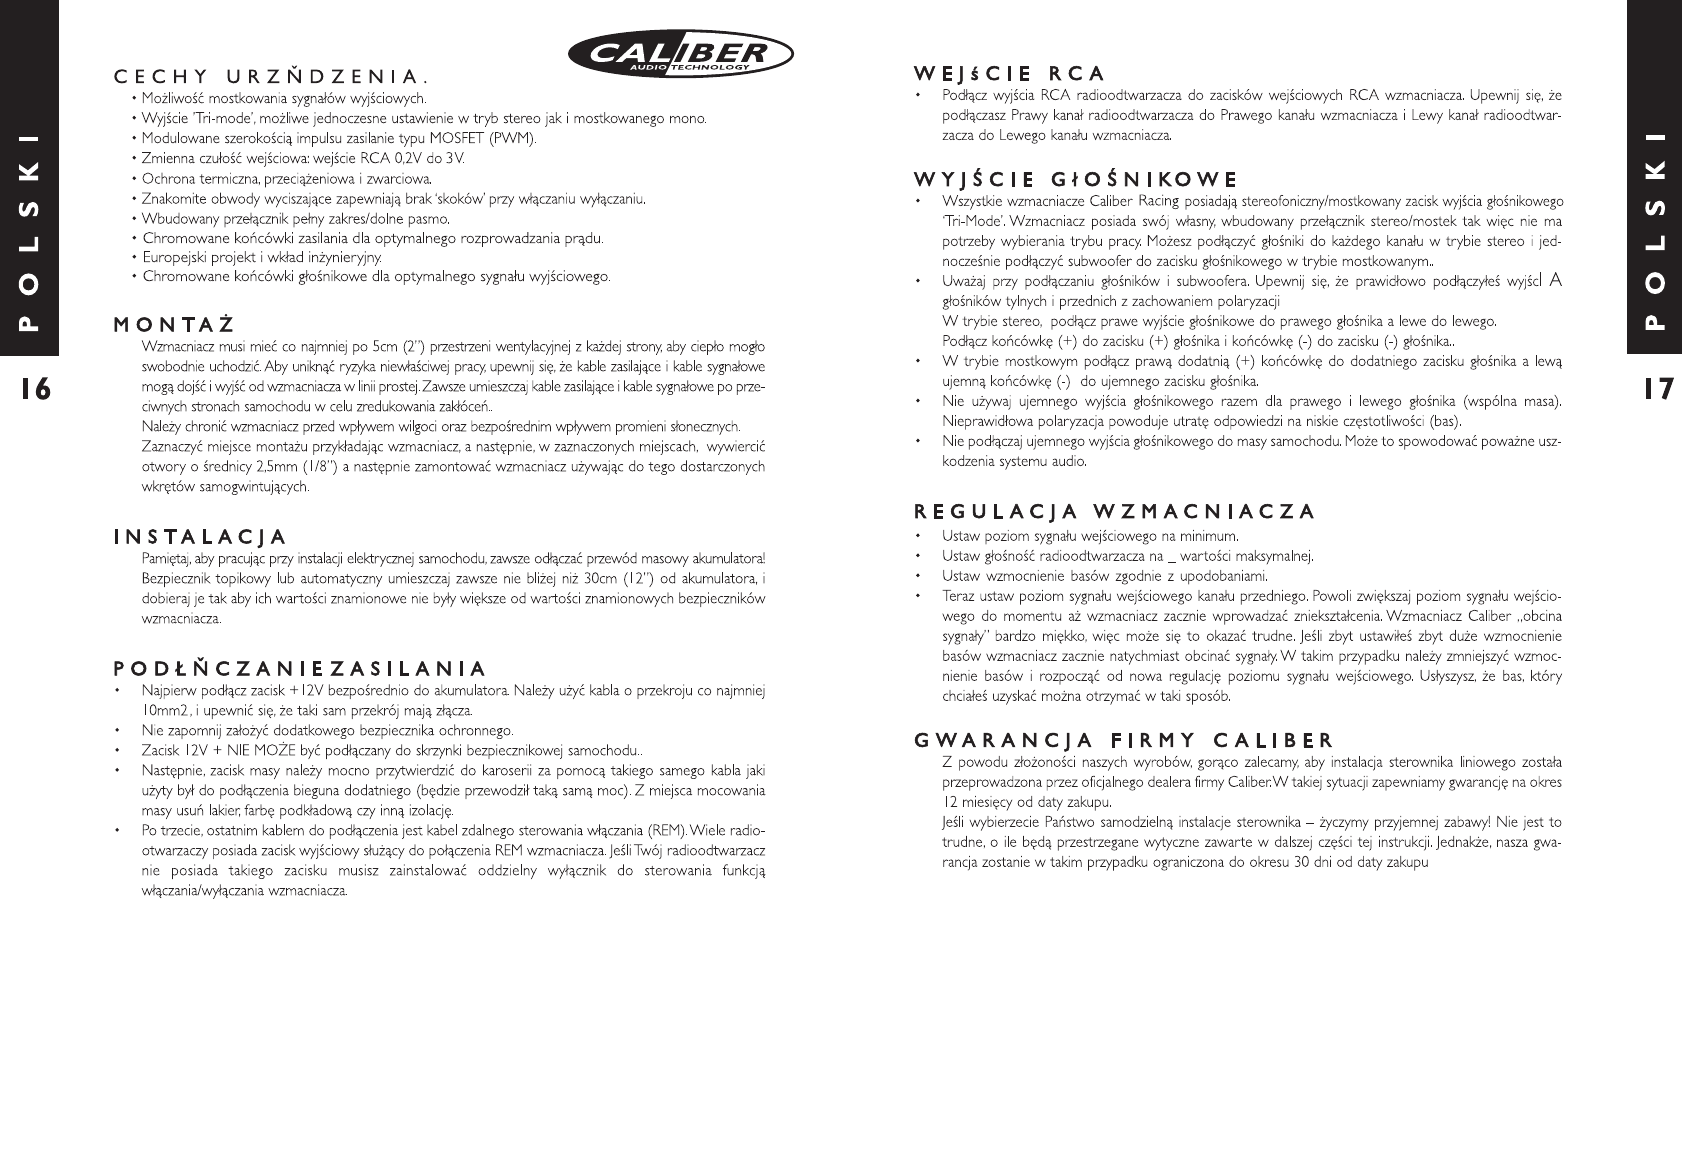 Handleiding Caliber ca 502 (pagina 11 van 12) (Deutsch, English ...